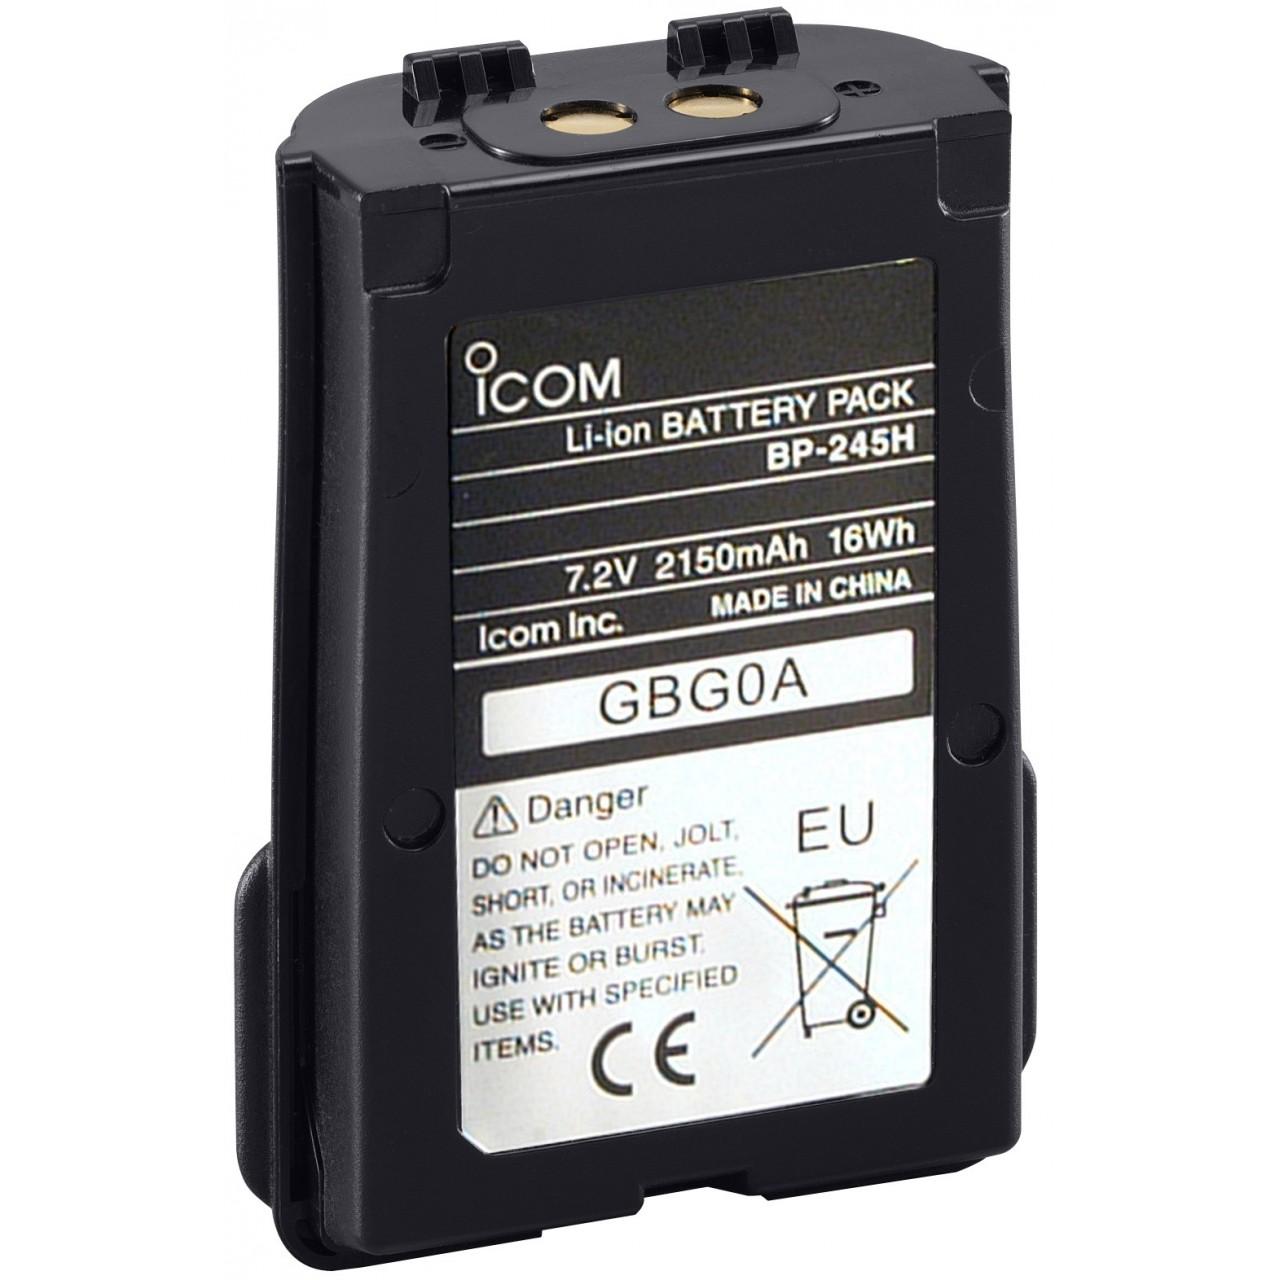 BP-245H Batteries - ICOM